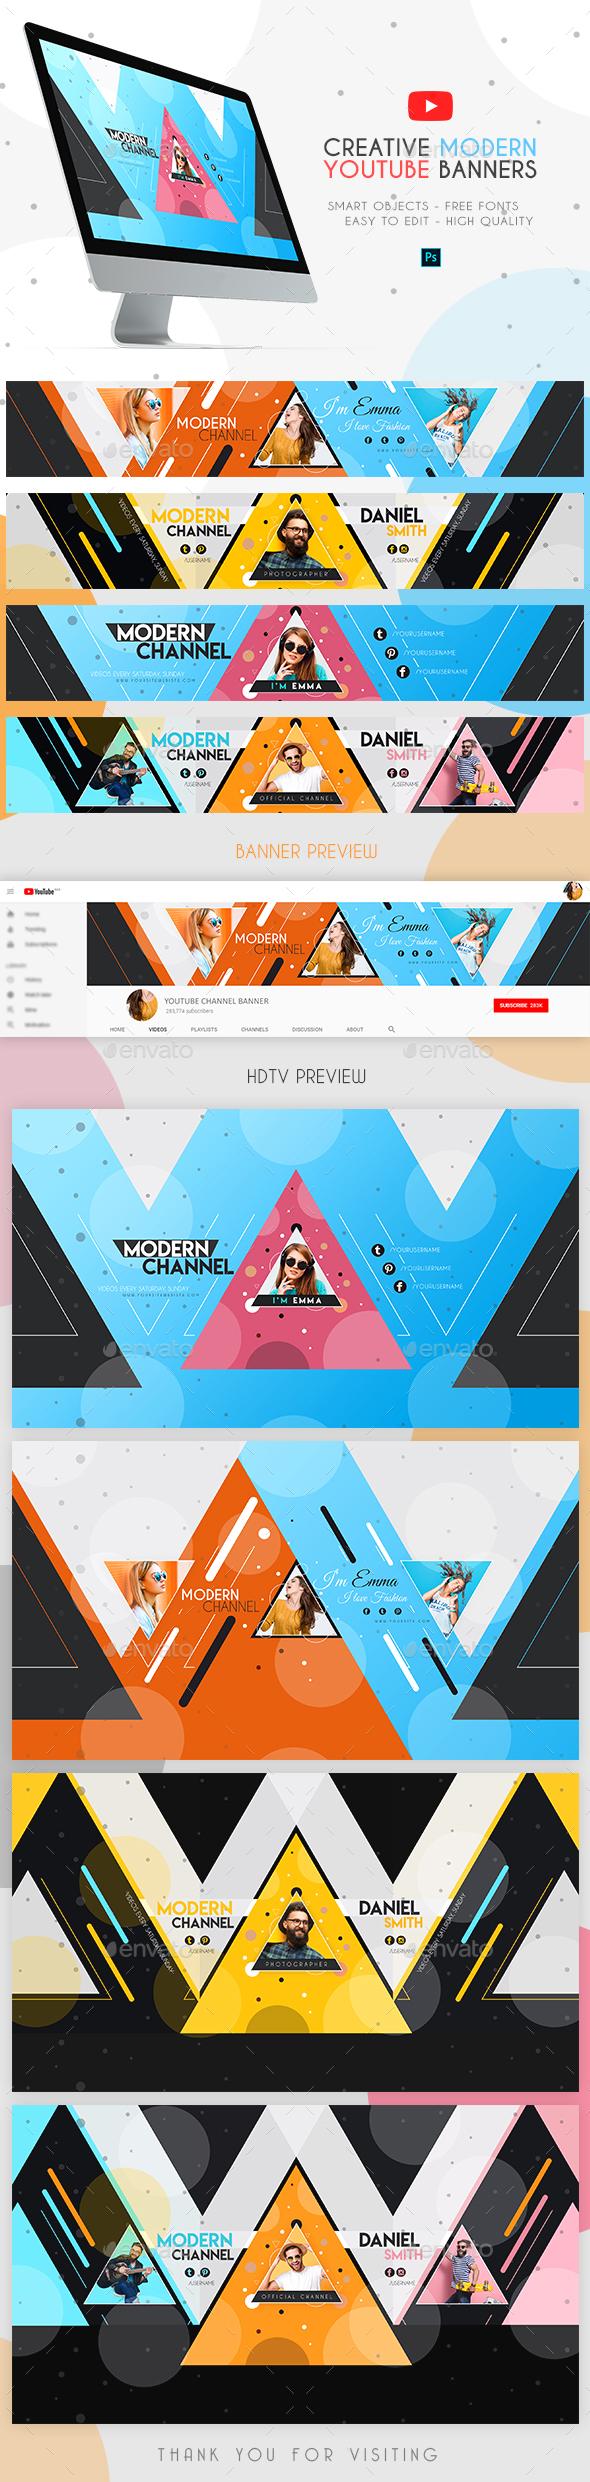 Modern YouTube Banners - YouTube Social Media